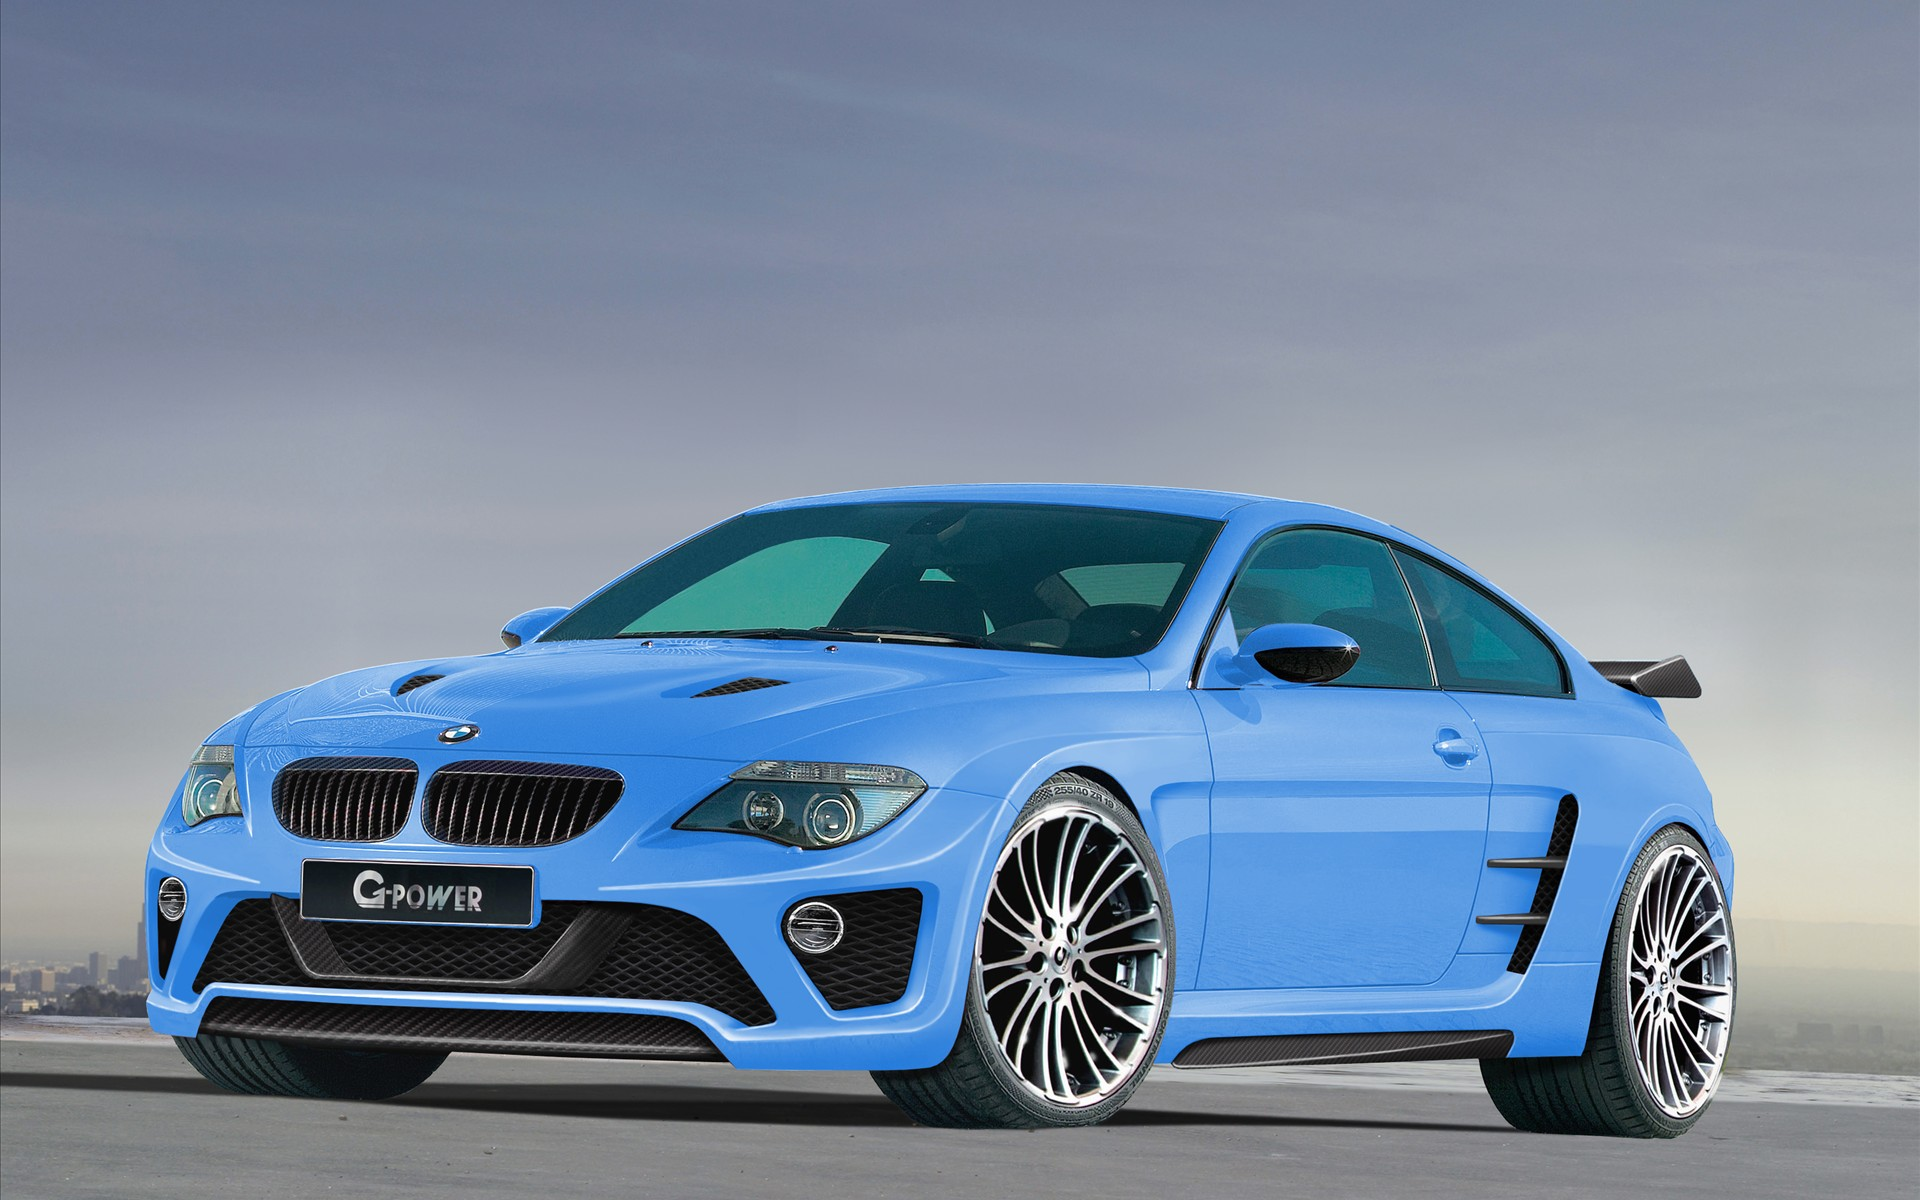 Vehículos - BMW  Bmw M6 Hurricane Cs G-power Fondo de Pantalla